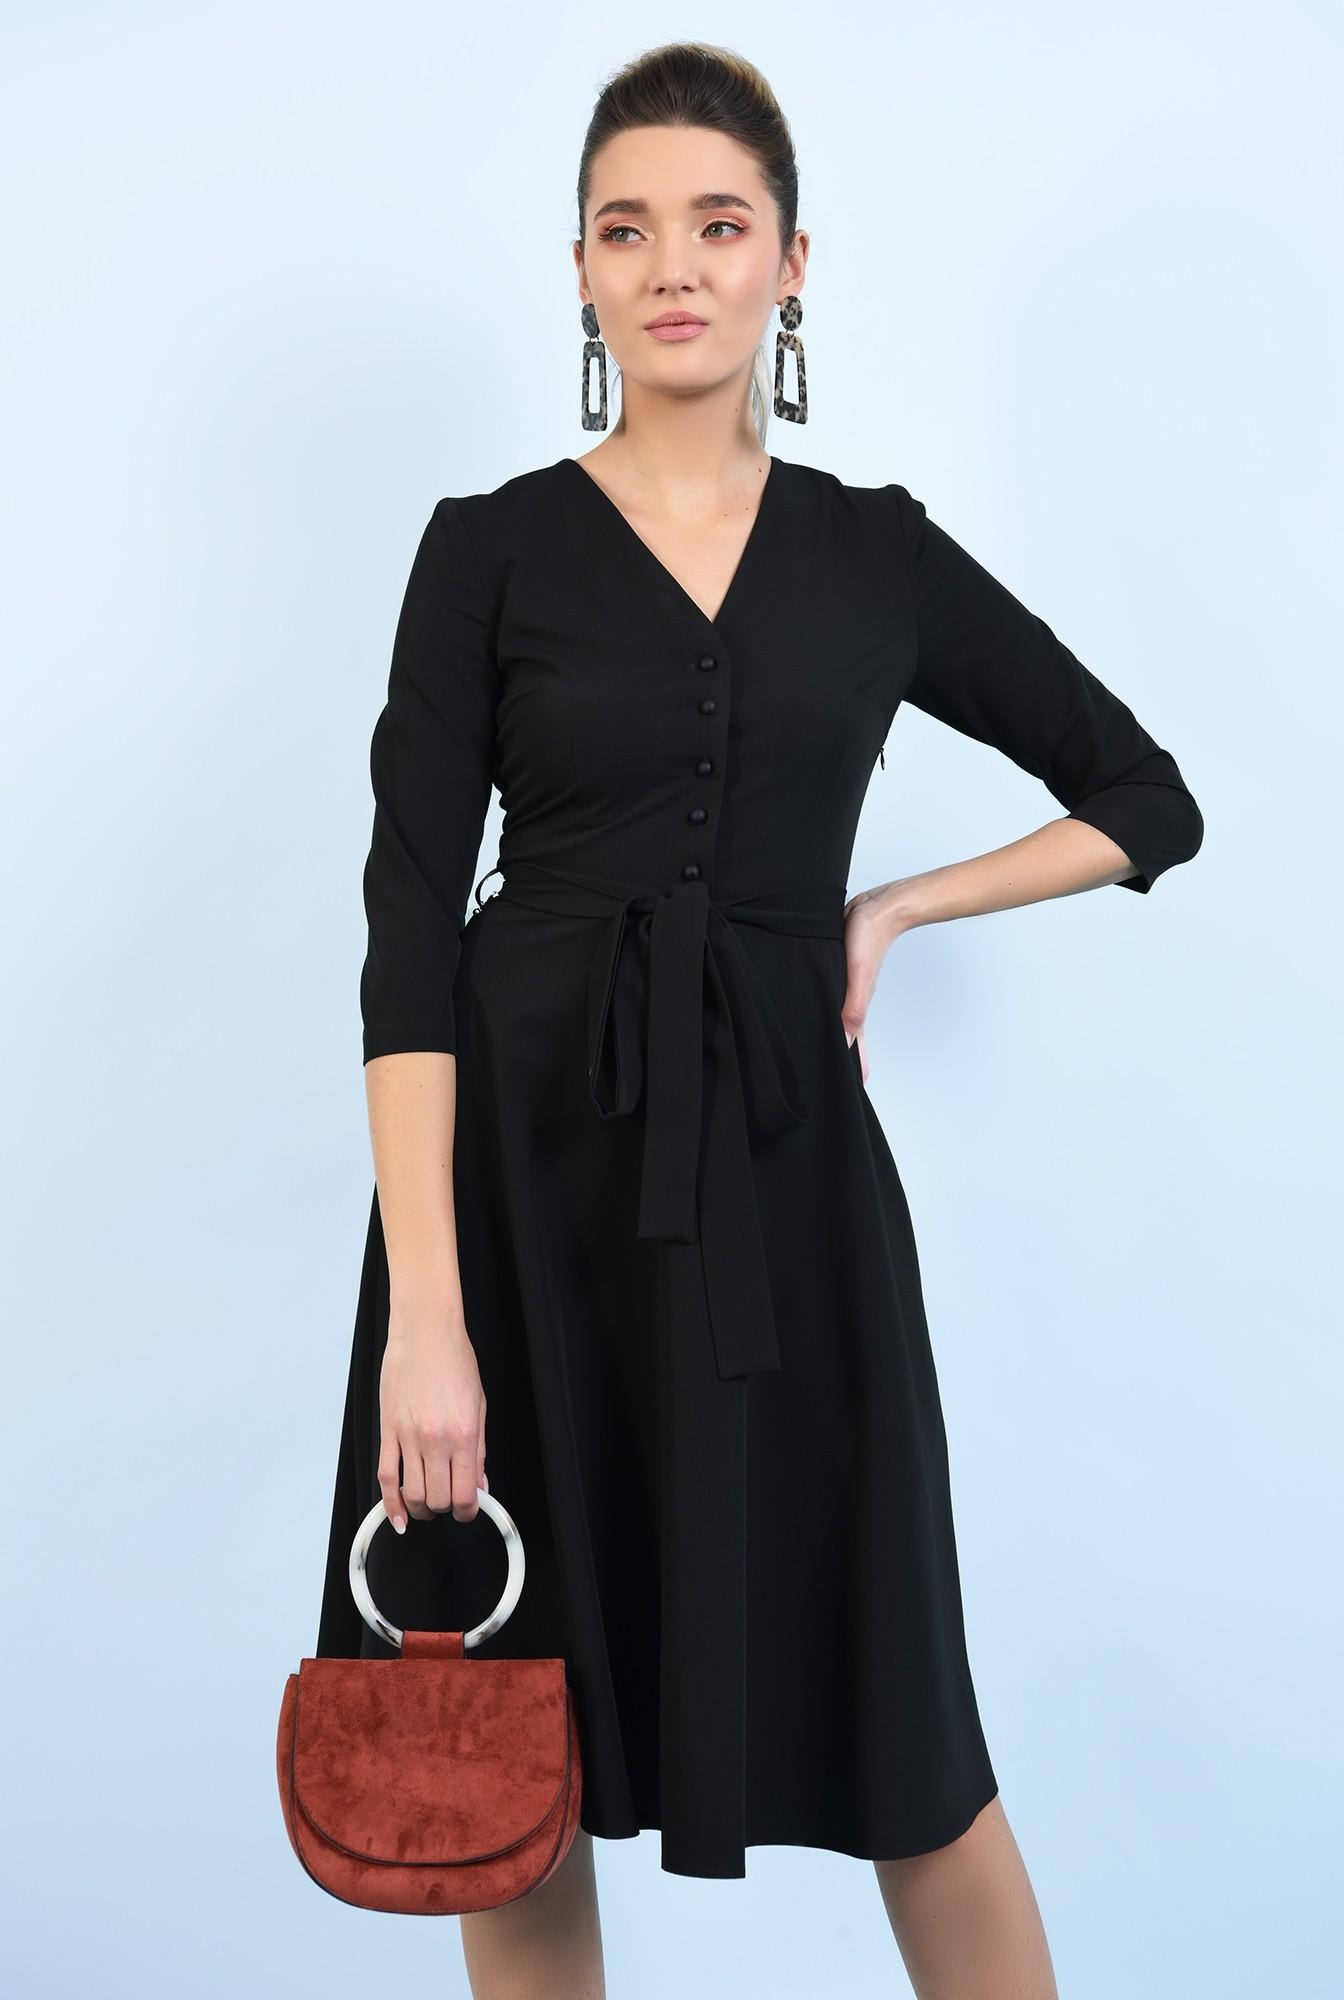 2 - 360 - rochie office, neagra, midi, cu nasturi, cu cordon